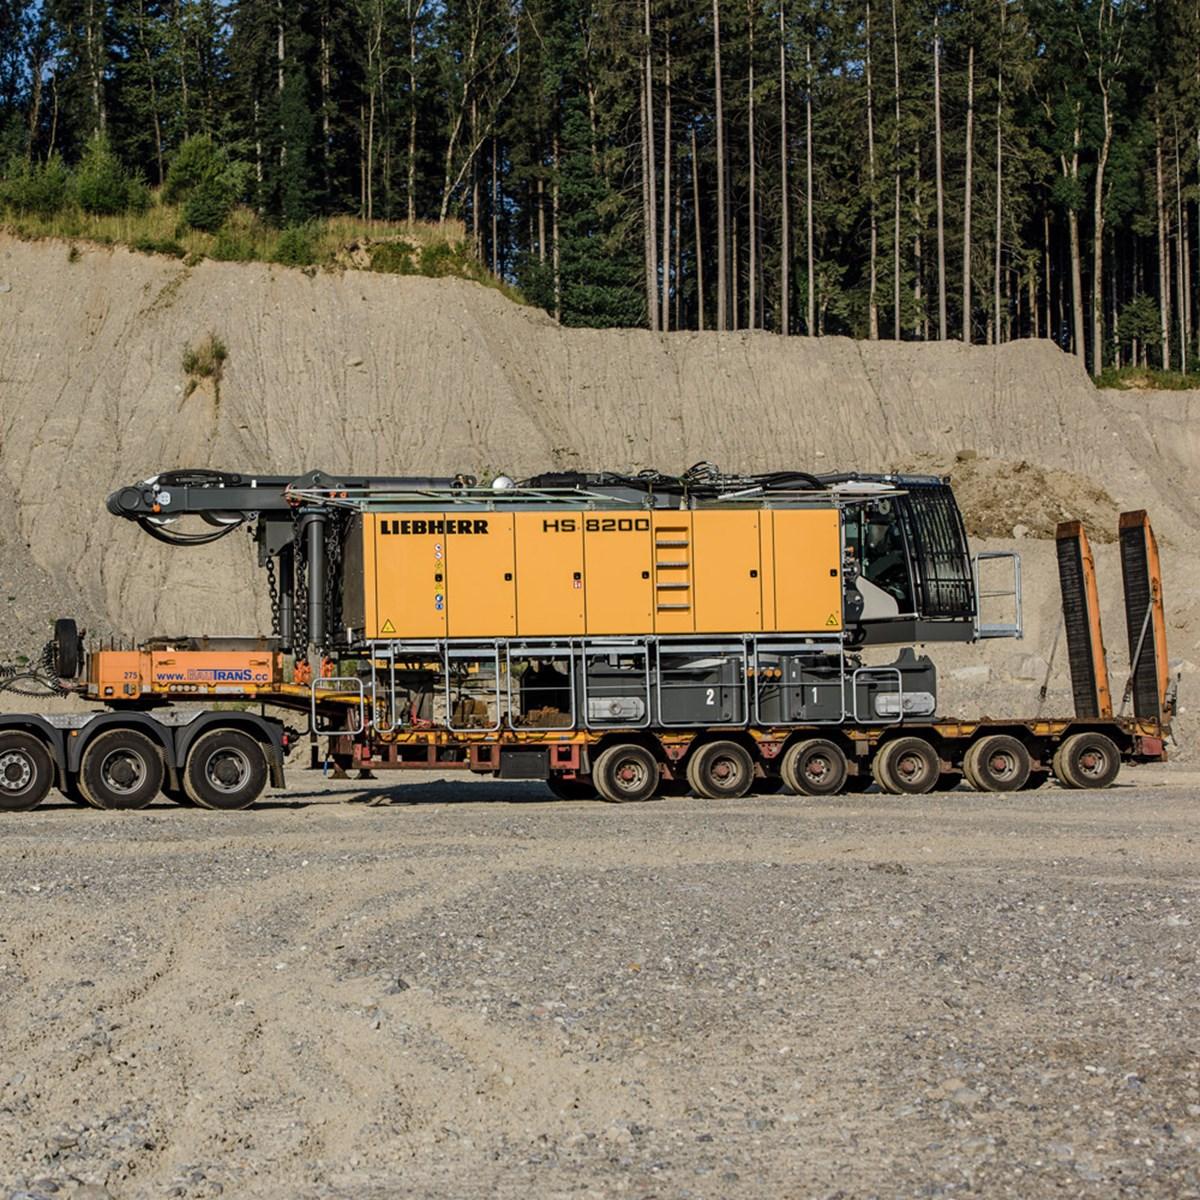 liebherr-hs-8200-seilbagger-duty-cycle-crawler-crane-transport-2.jpg